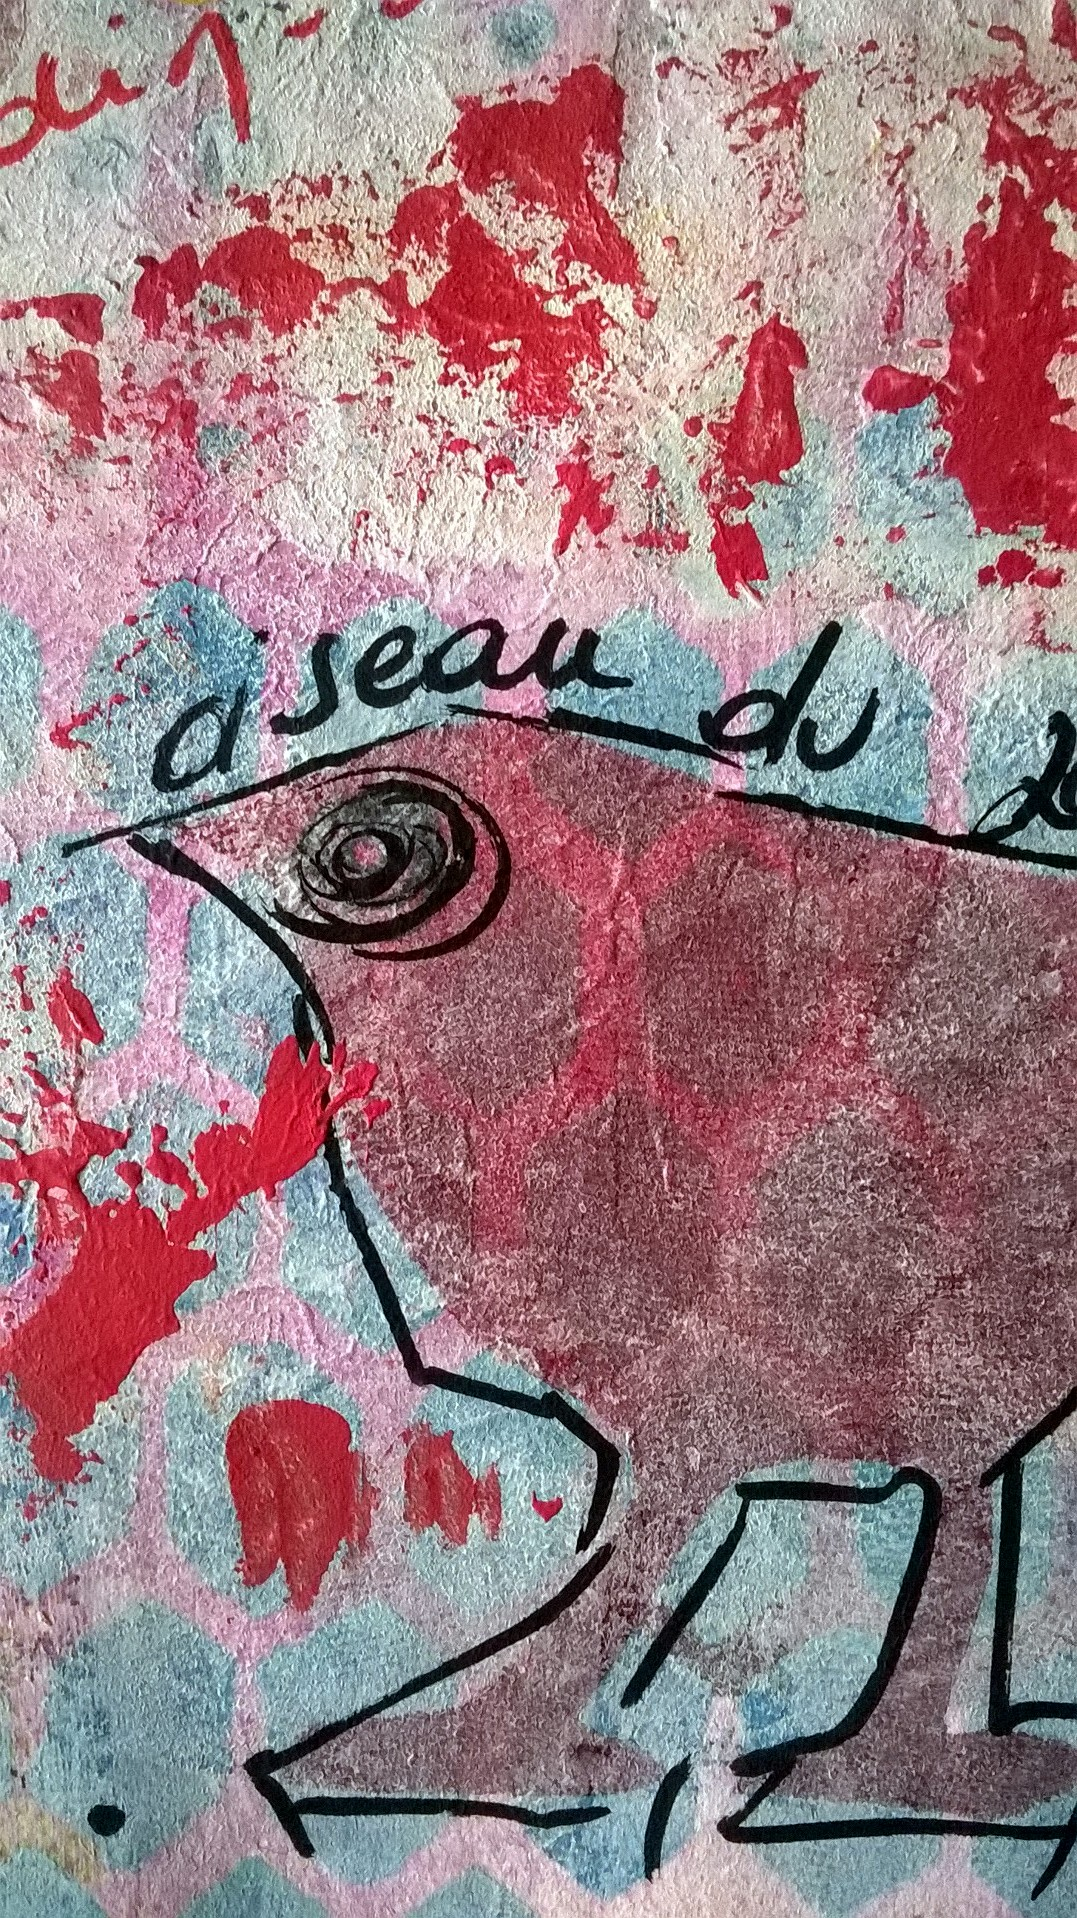 Mixed Media - 100 artworks - #43 Oiseau de Jardin